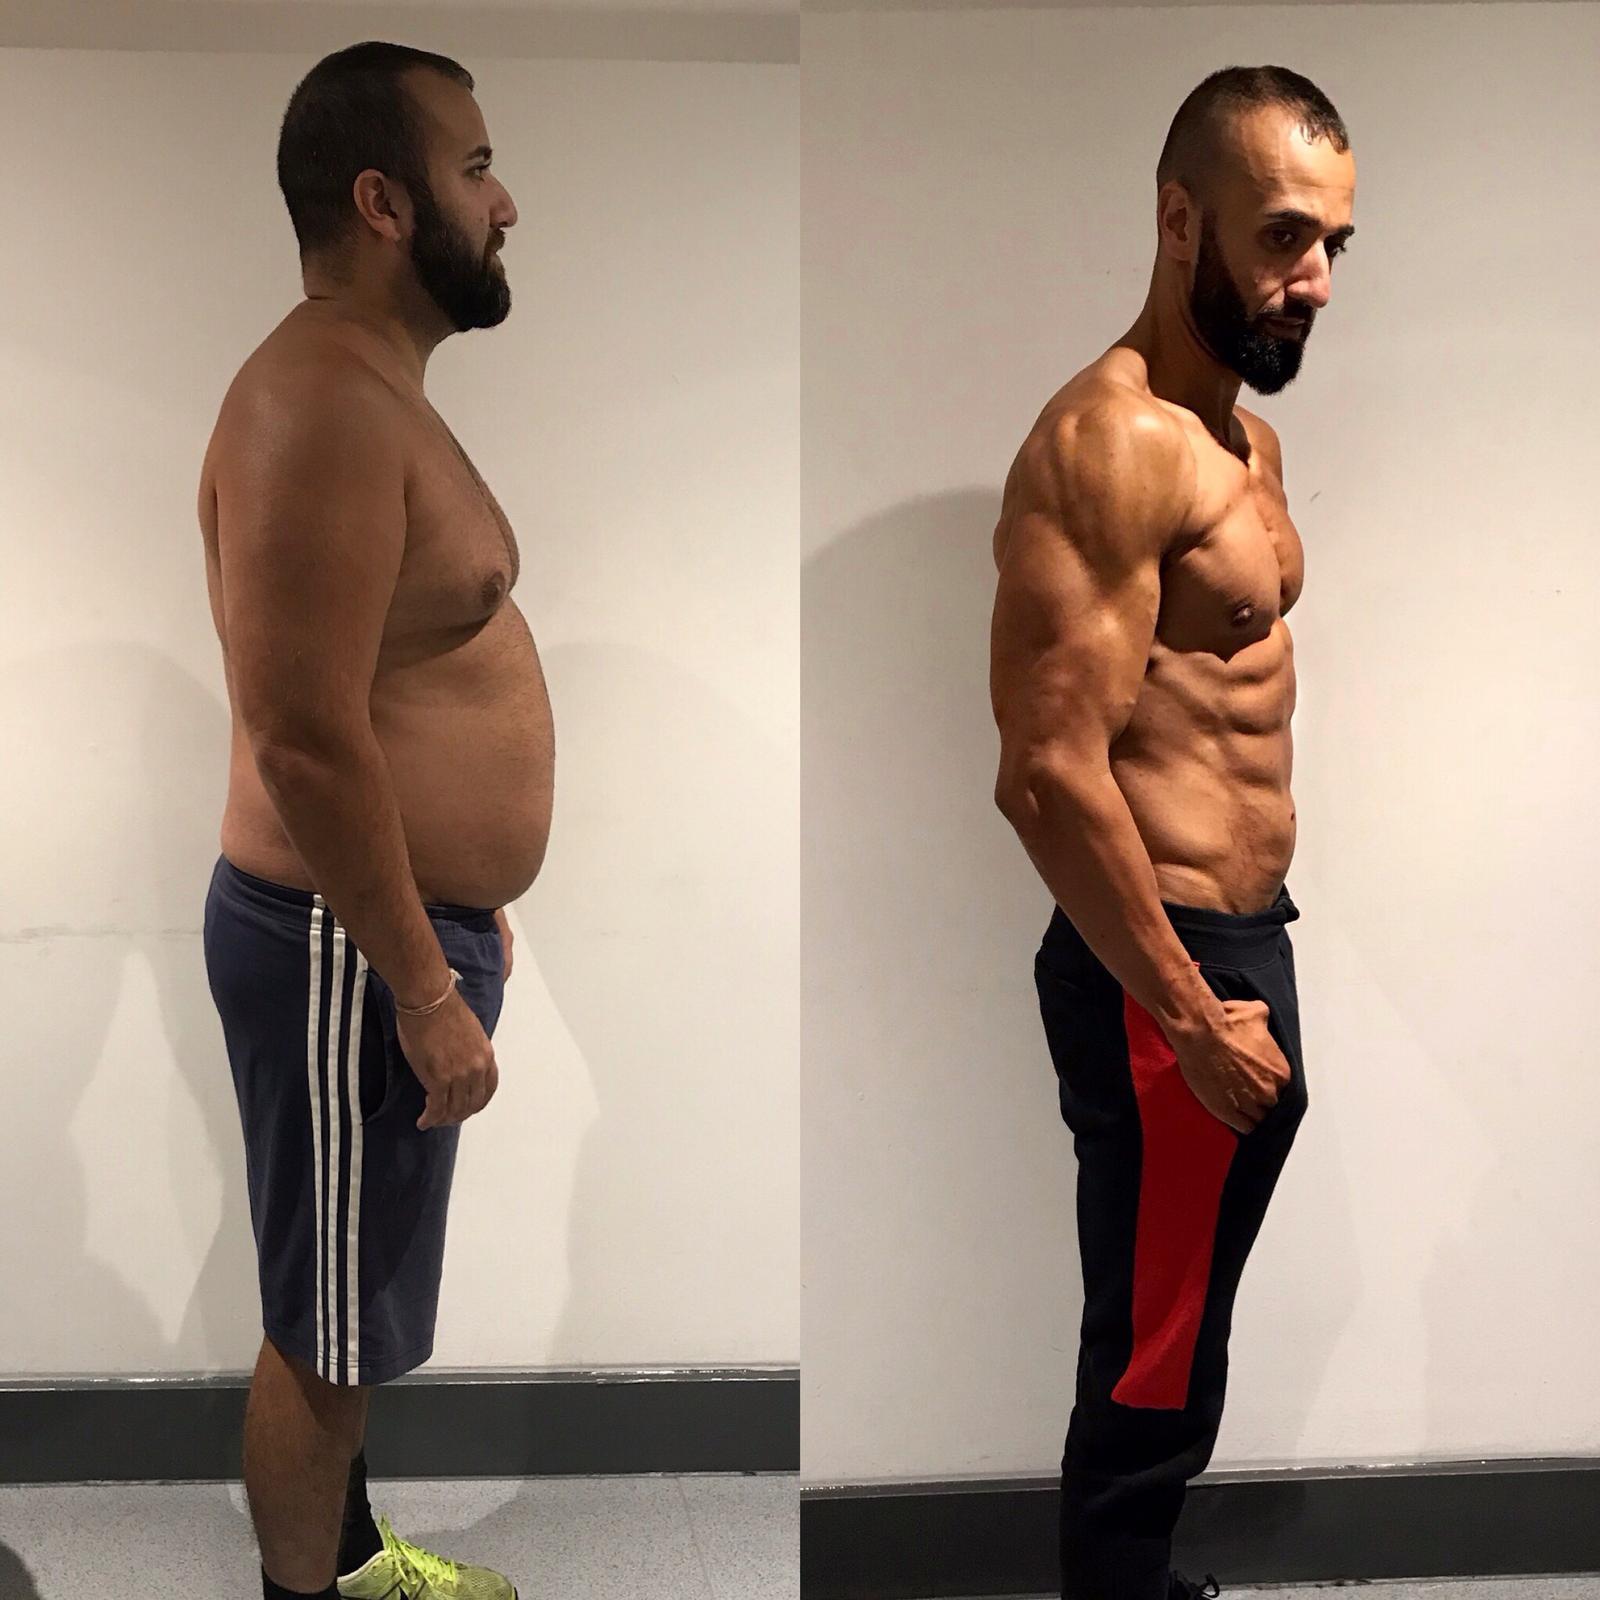 Vik - 12 months